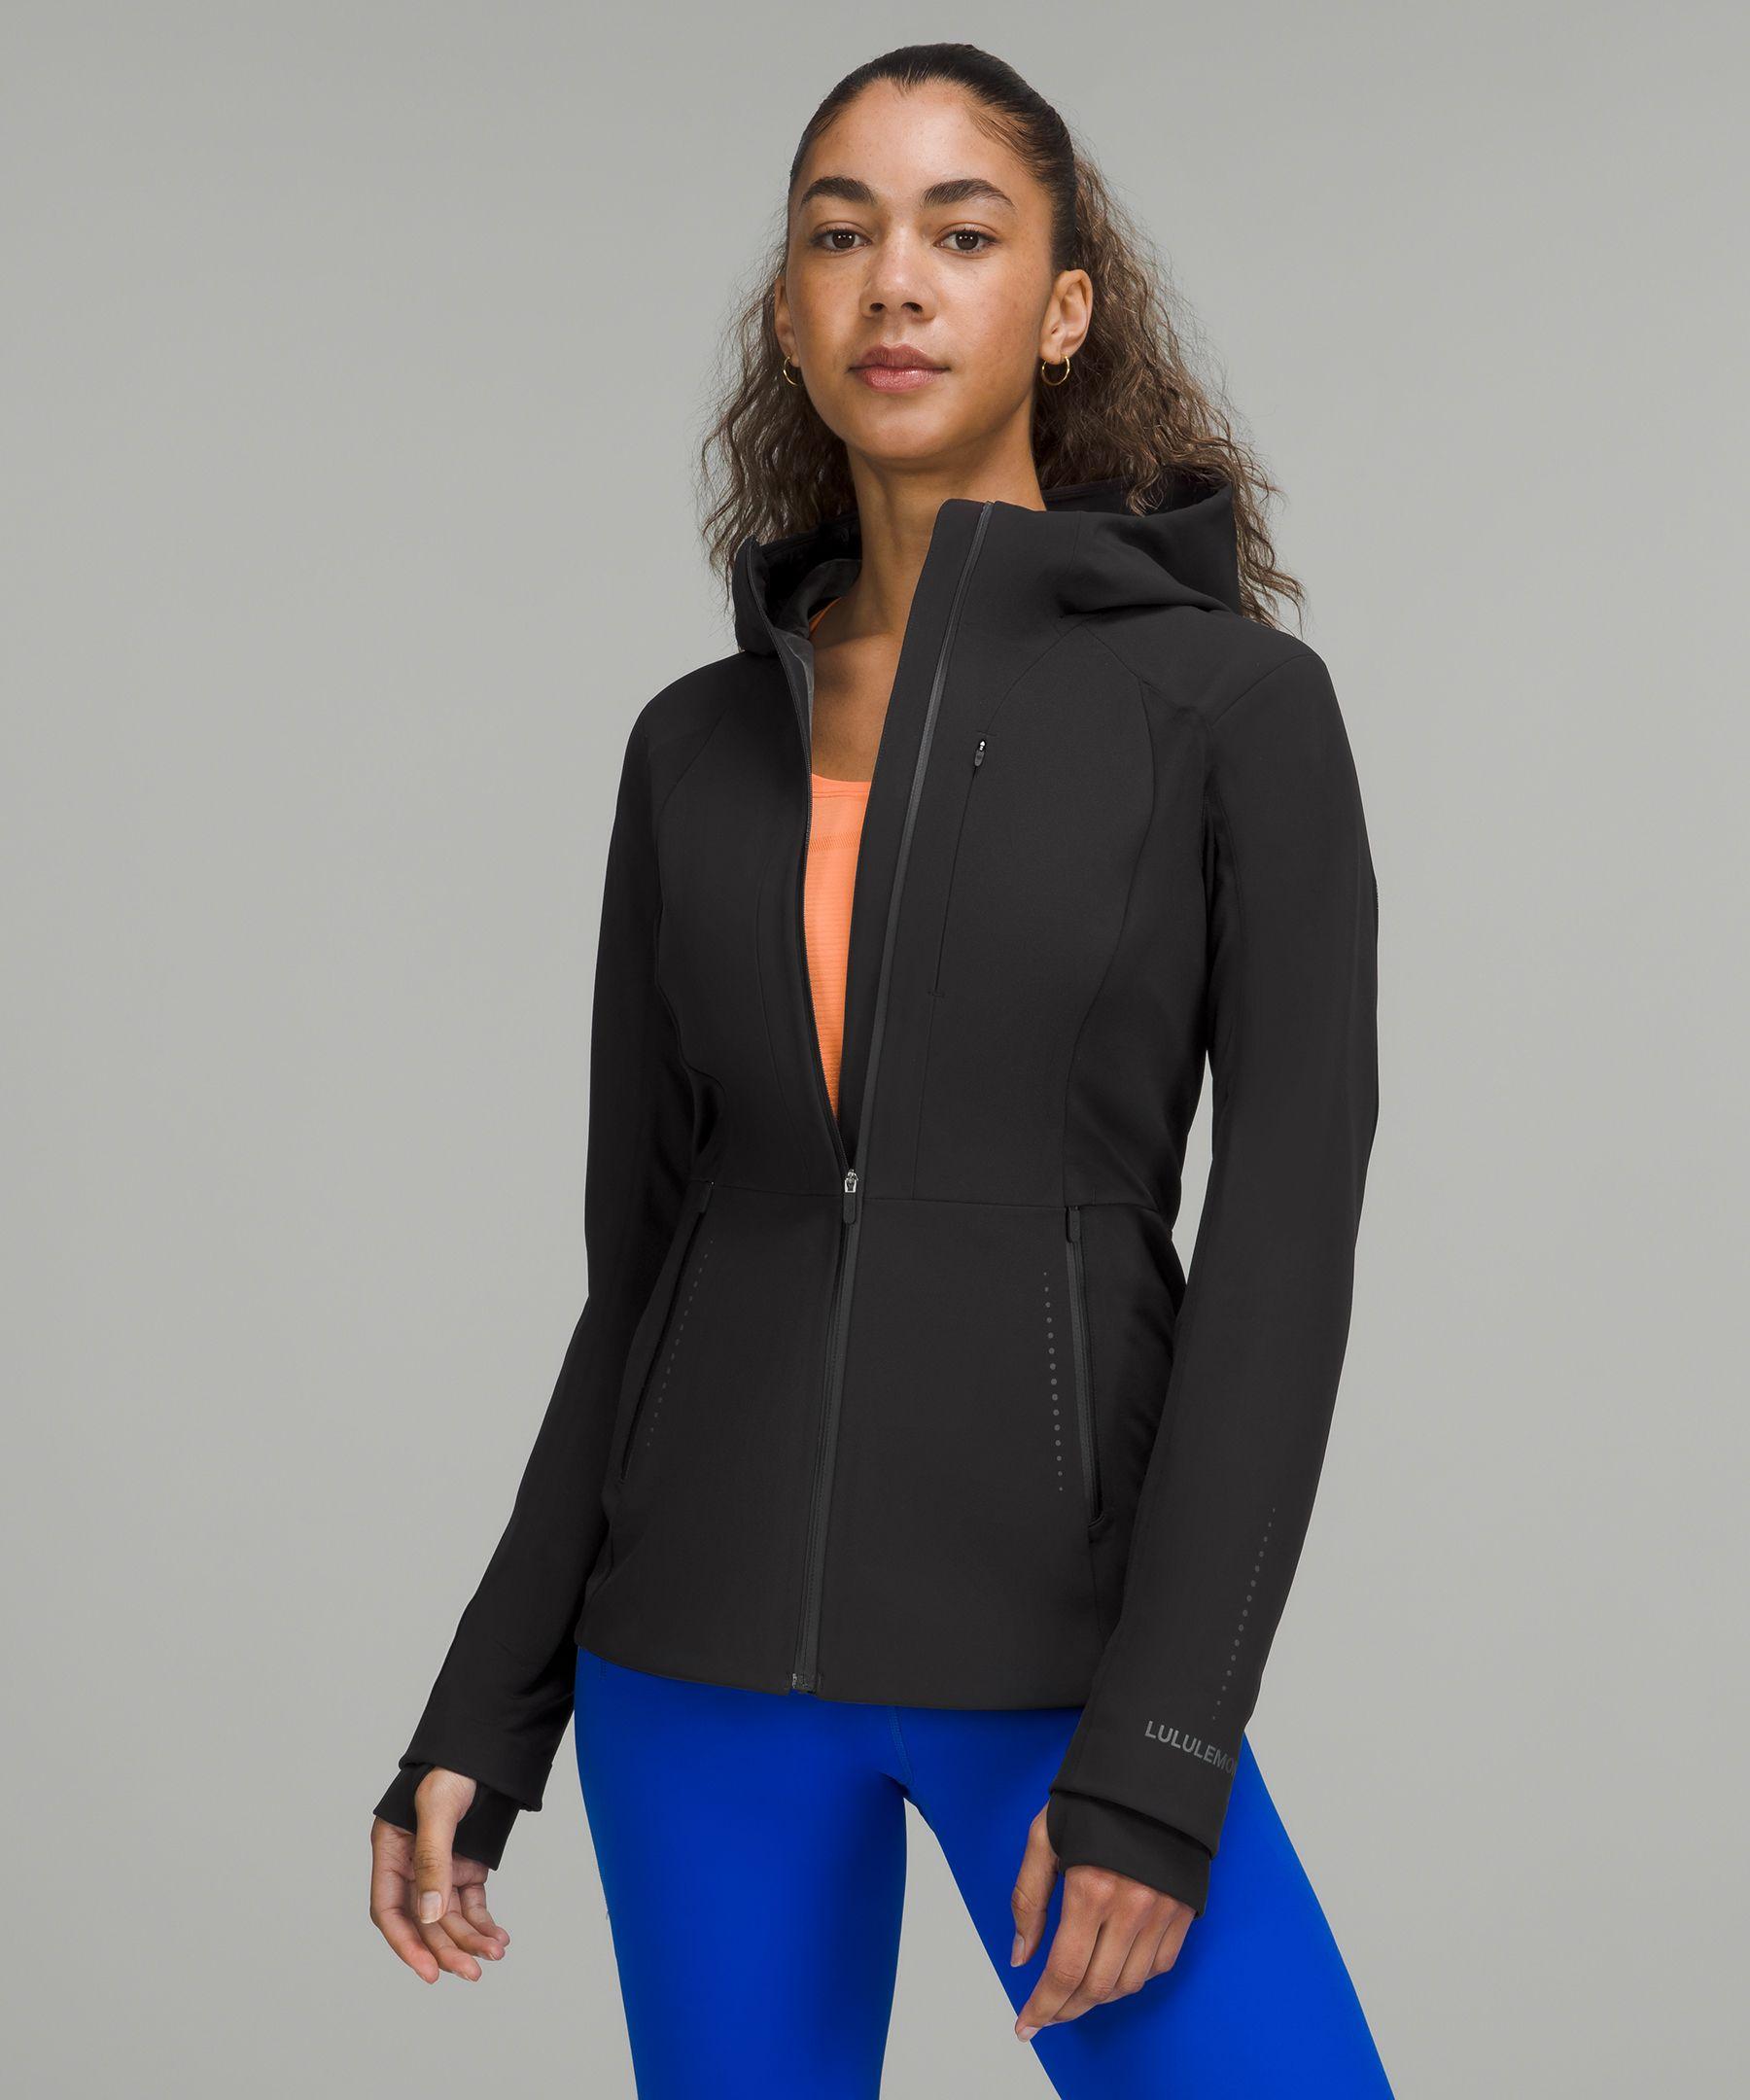 Lululemon Cross Chill Jacket In Black